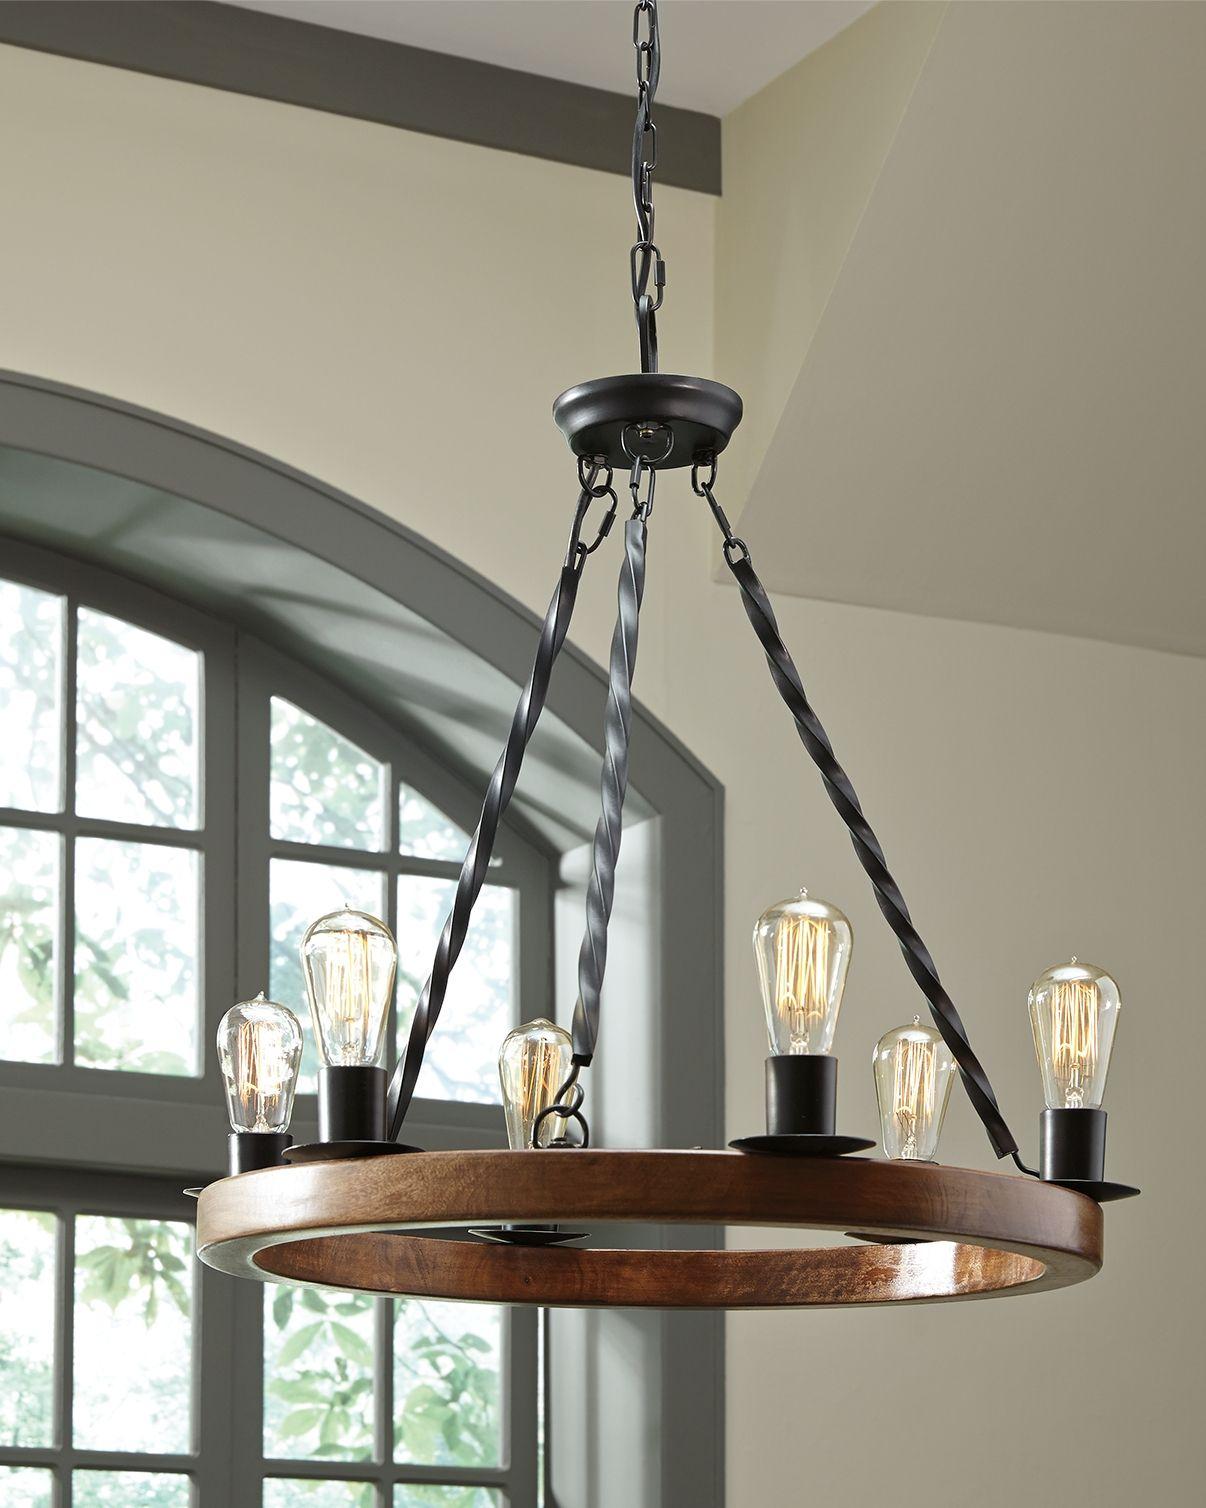 Plato Pendant Light, Brown/black   Products In 2019   Wood Inside Farrier 3 Light Lantern Drum Pendants (View 21 of 30)